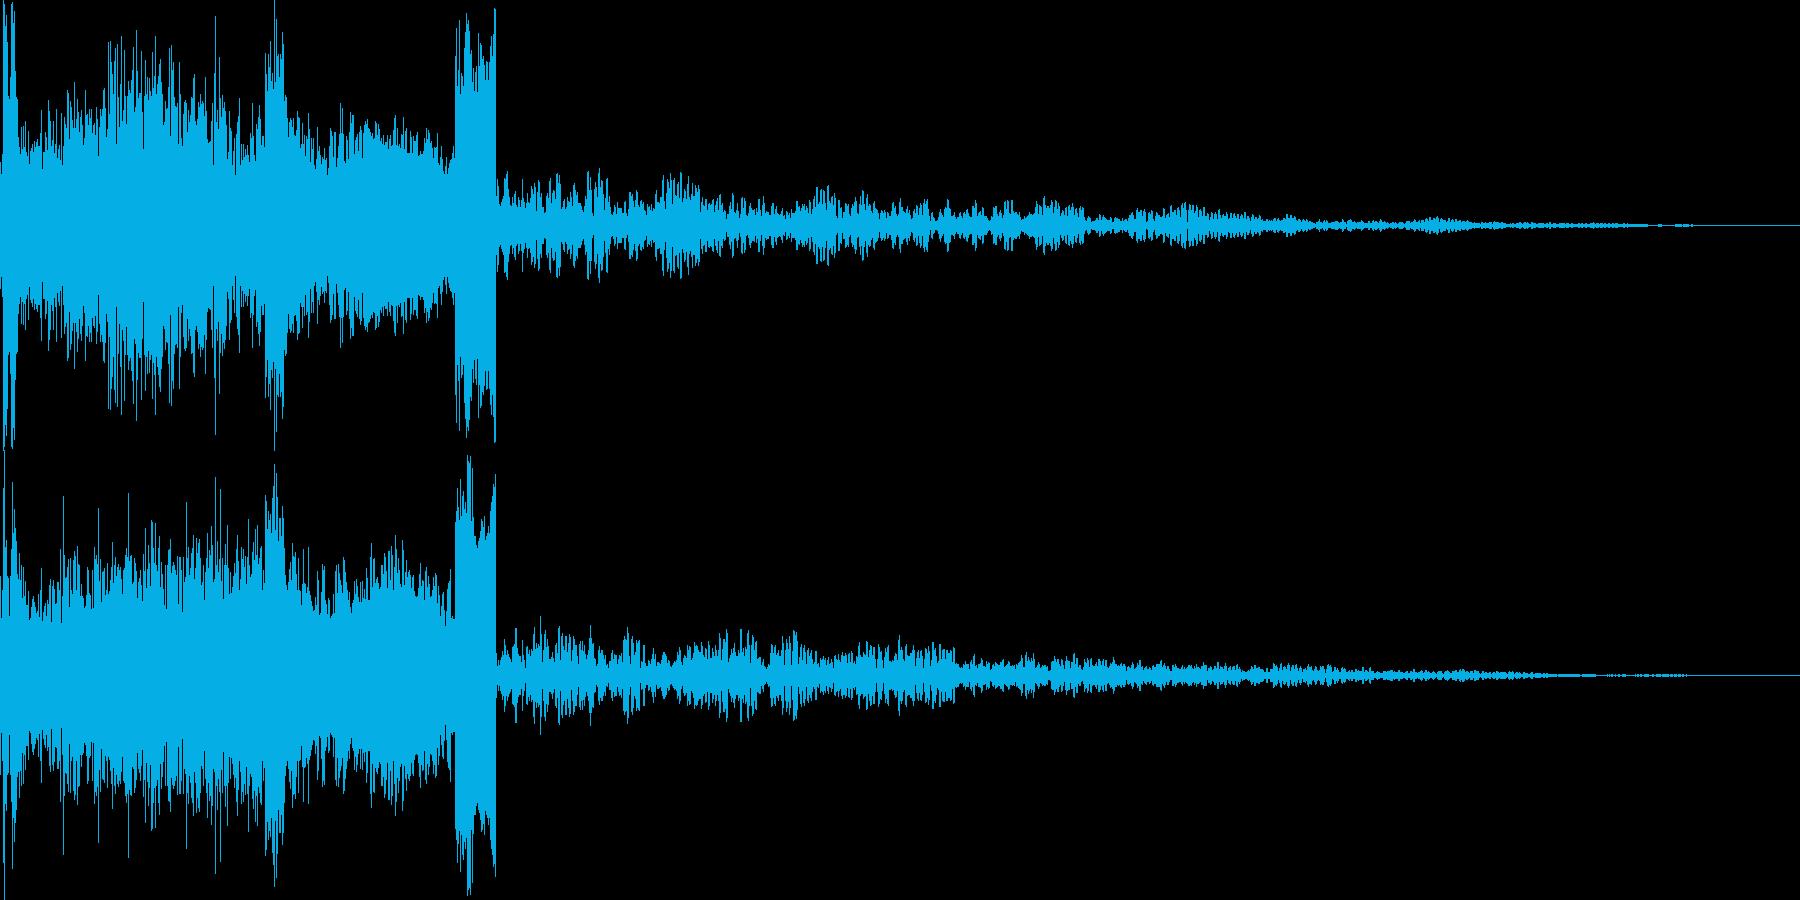 FMラジオジングル制作にピッタリな効果音の再生済みの波形